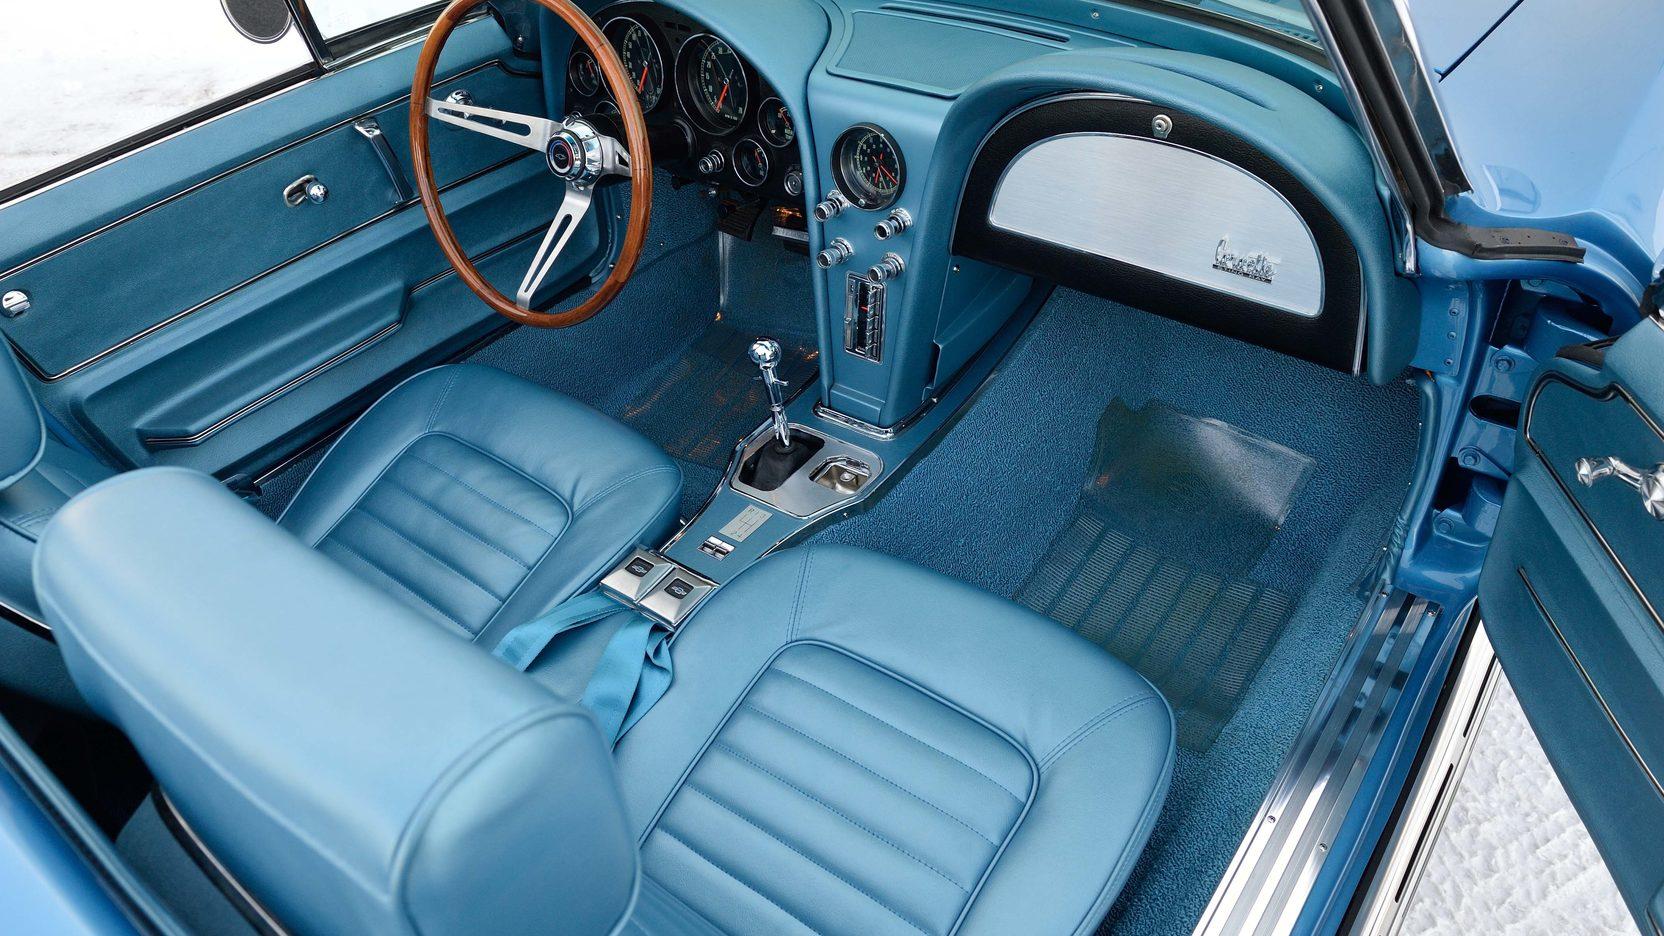 1966 Chevrolet Corvette interior